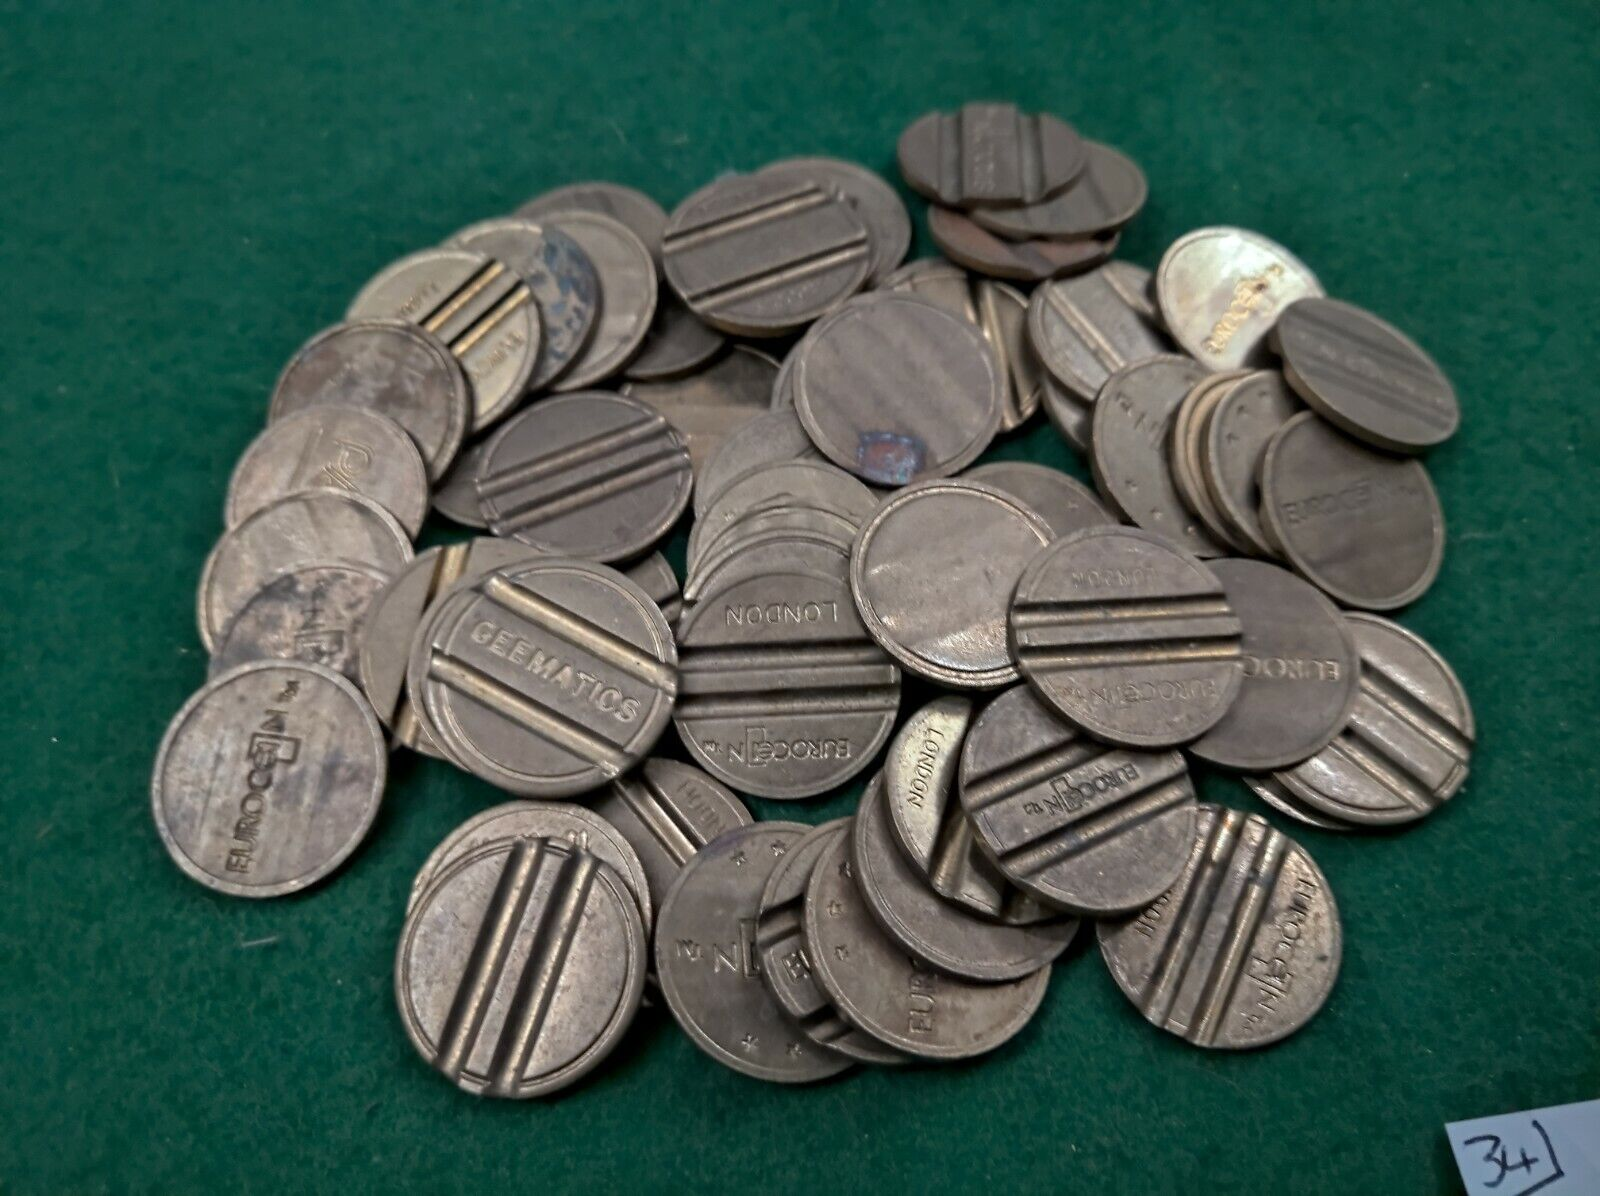 Fruit machine 20p tokens, Brasss, assorted x60